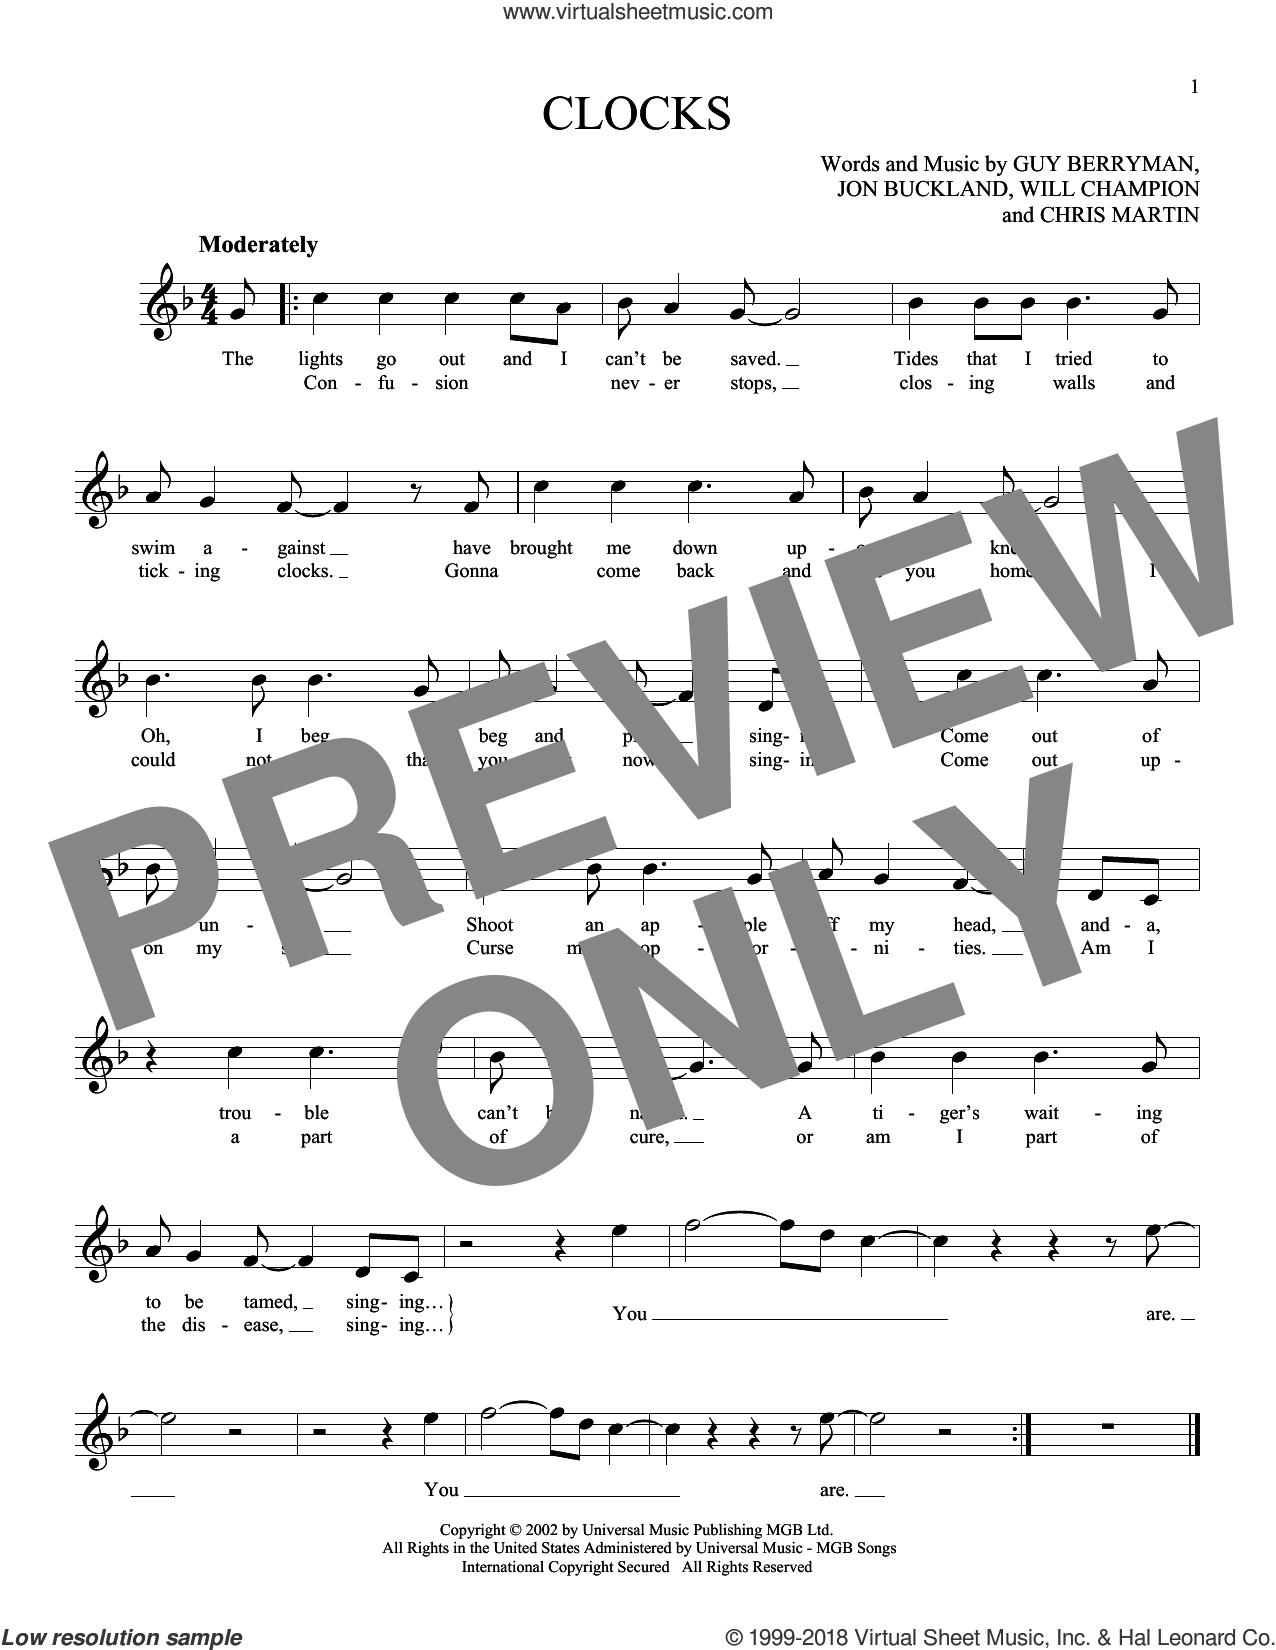 Clocks sheet music for ocarina solo by Chris Martin, Coldplay, Guy Berryman, Jon Buckland and Will Champion, intermediate skill level